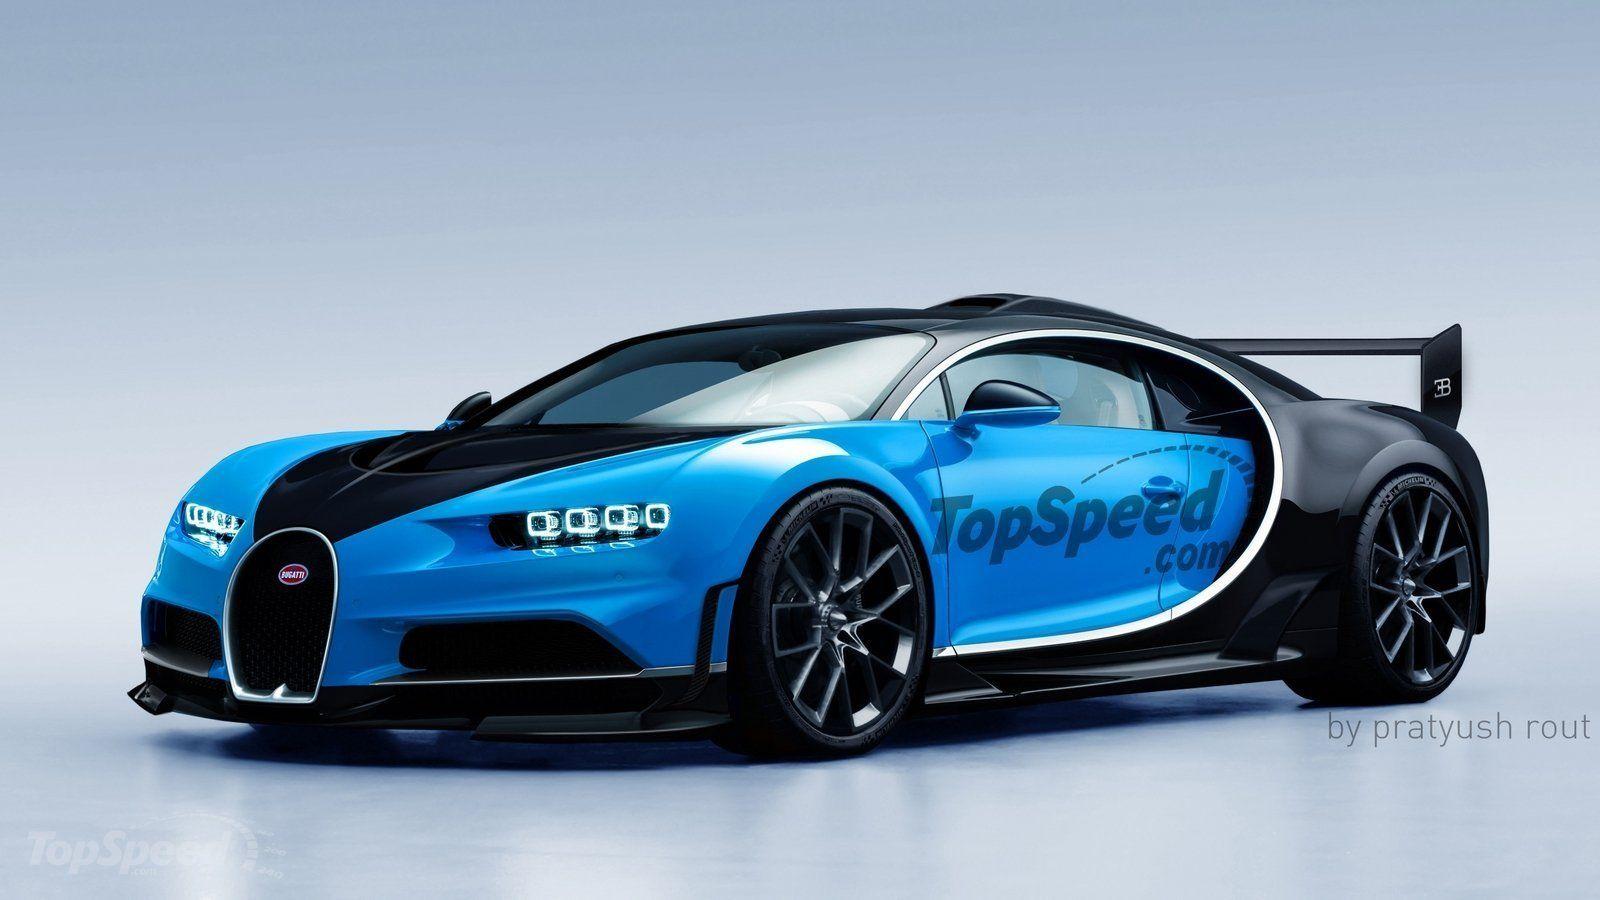 2021 Bugatti Chiron Super Sport Top Speed Bugatti Super Sport Bugatti Veyron Price Sports Cars Bugatti